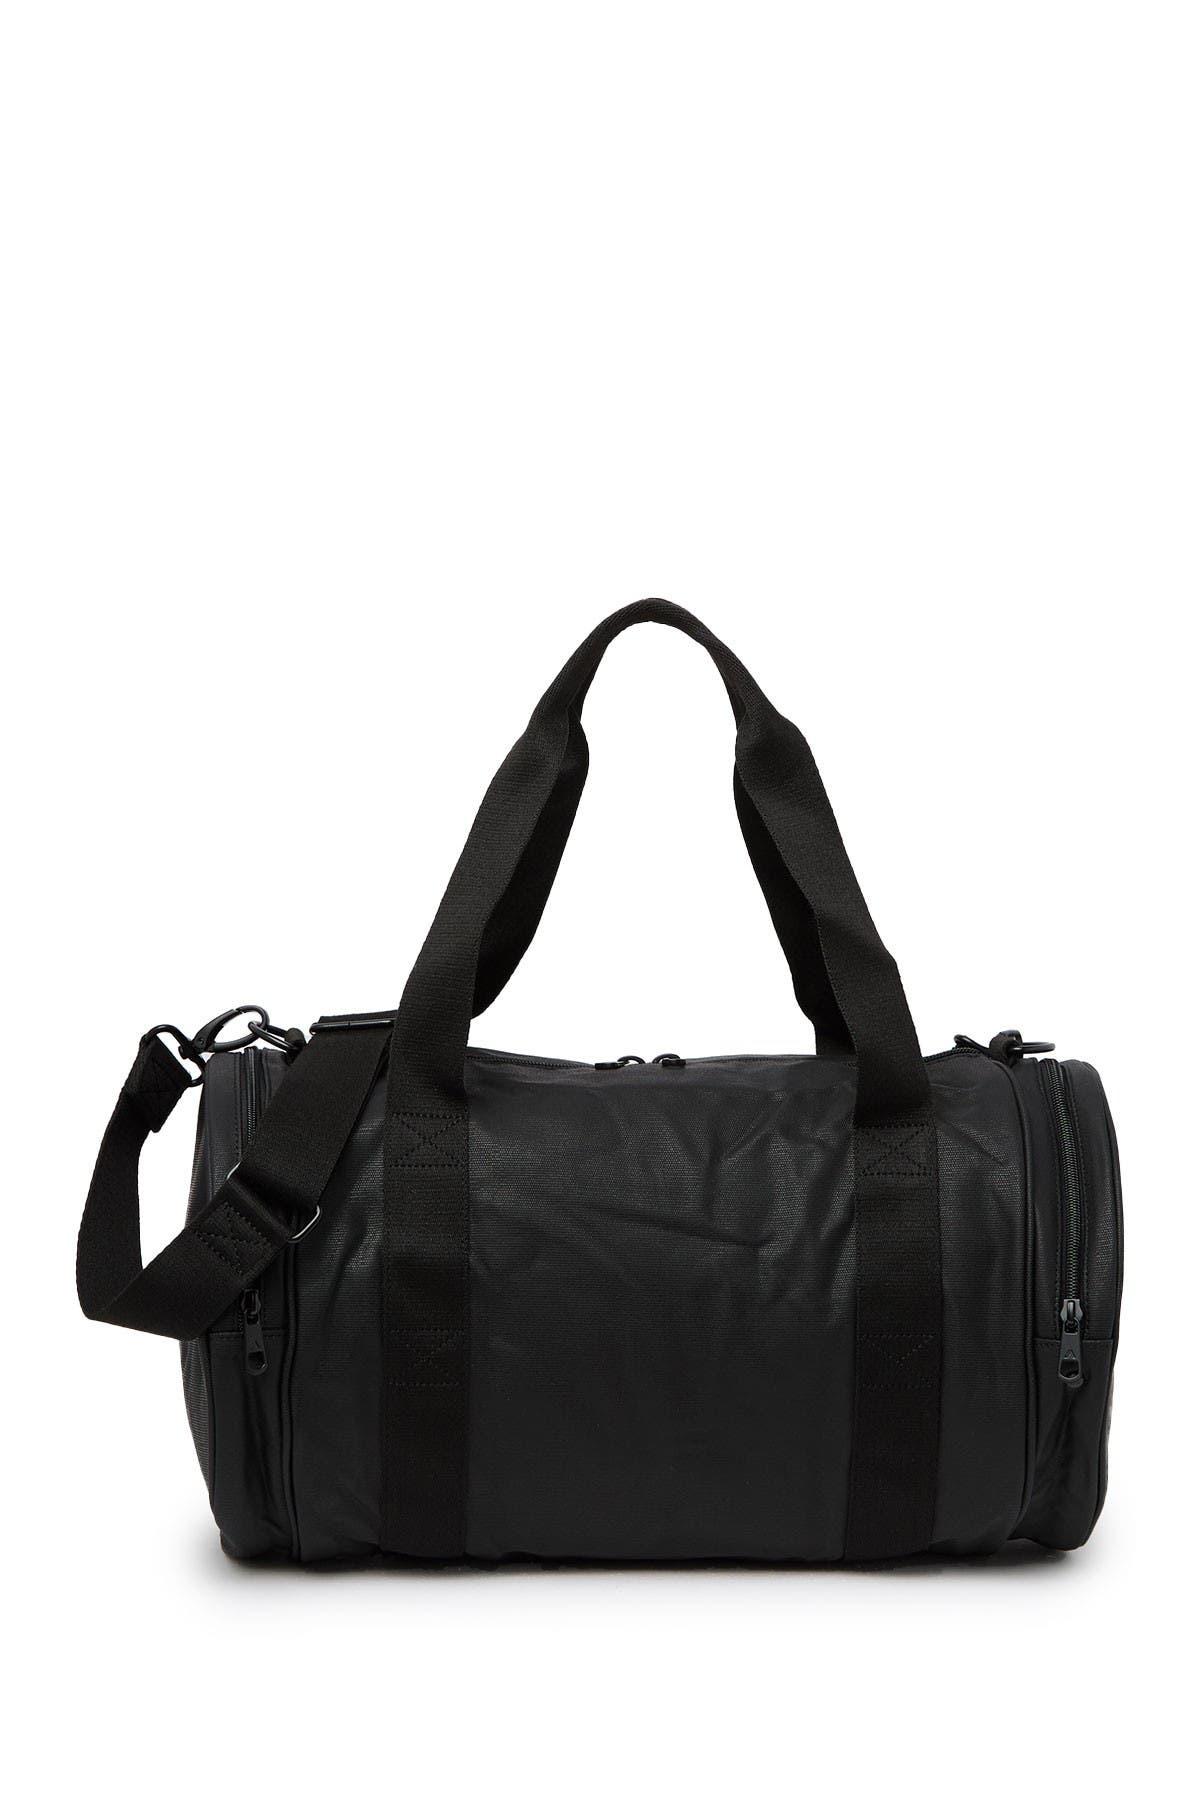 Image of STATE Bags Felix Barrel Duffle Bag